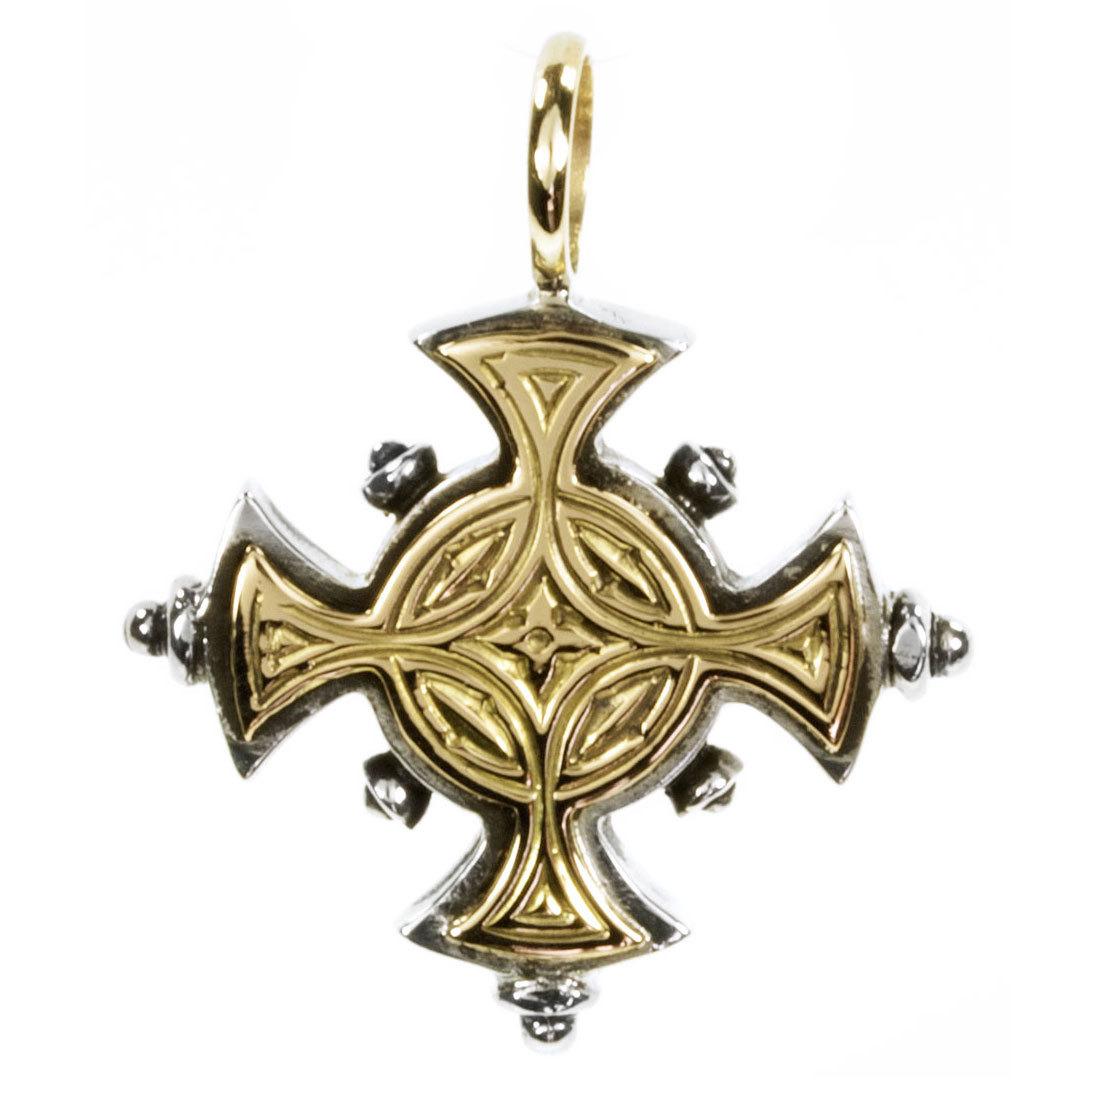 02005017 gerochristo 5017 byzantine medieval cross pendant 20